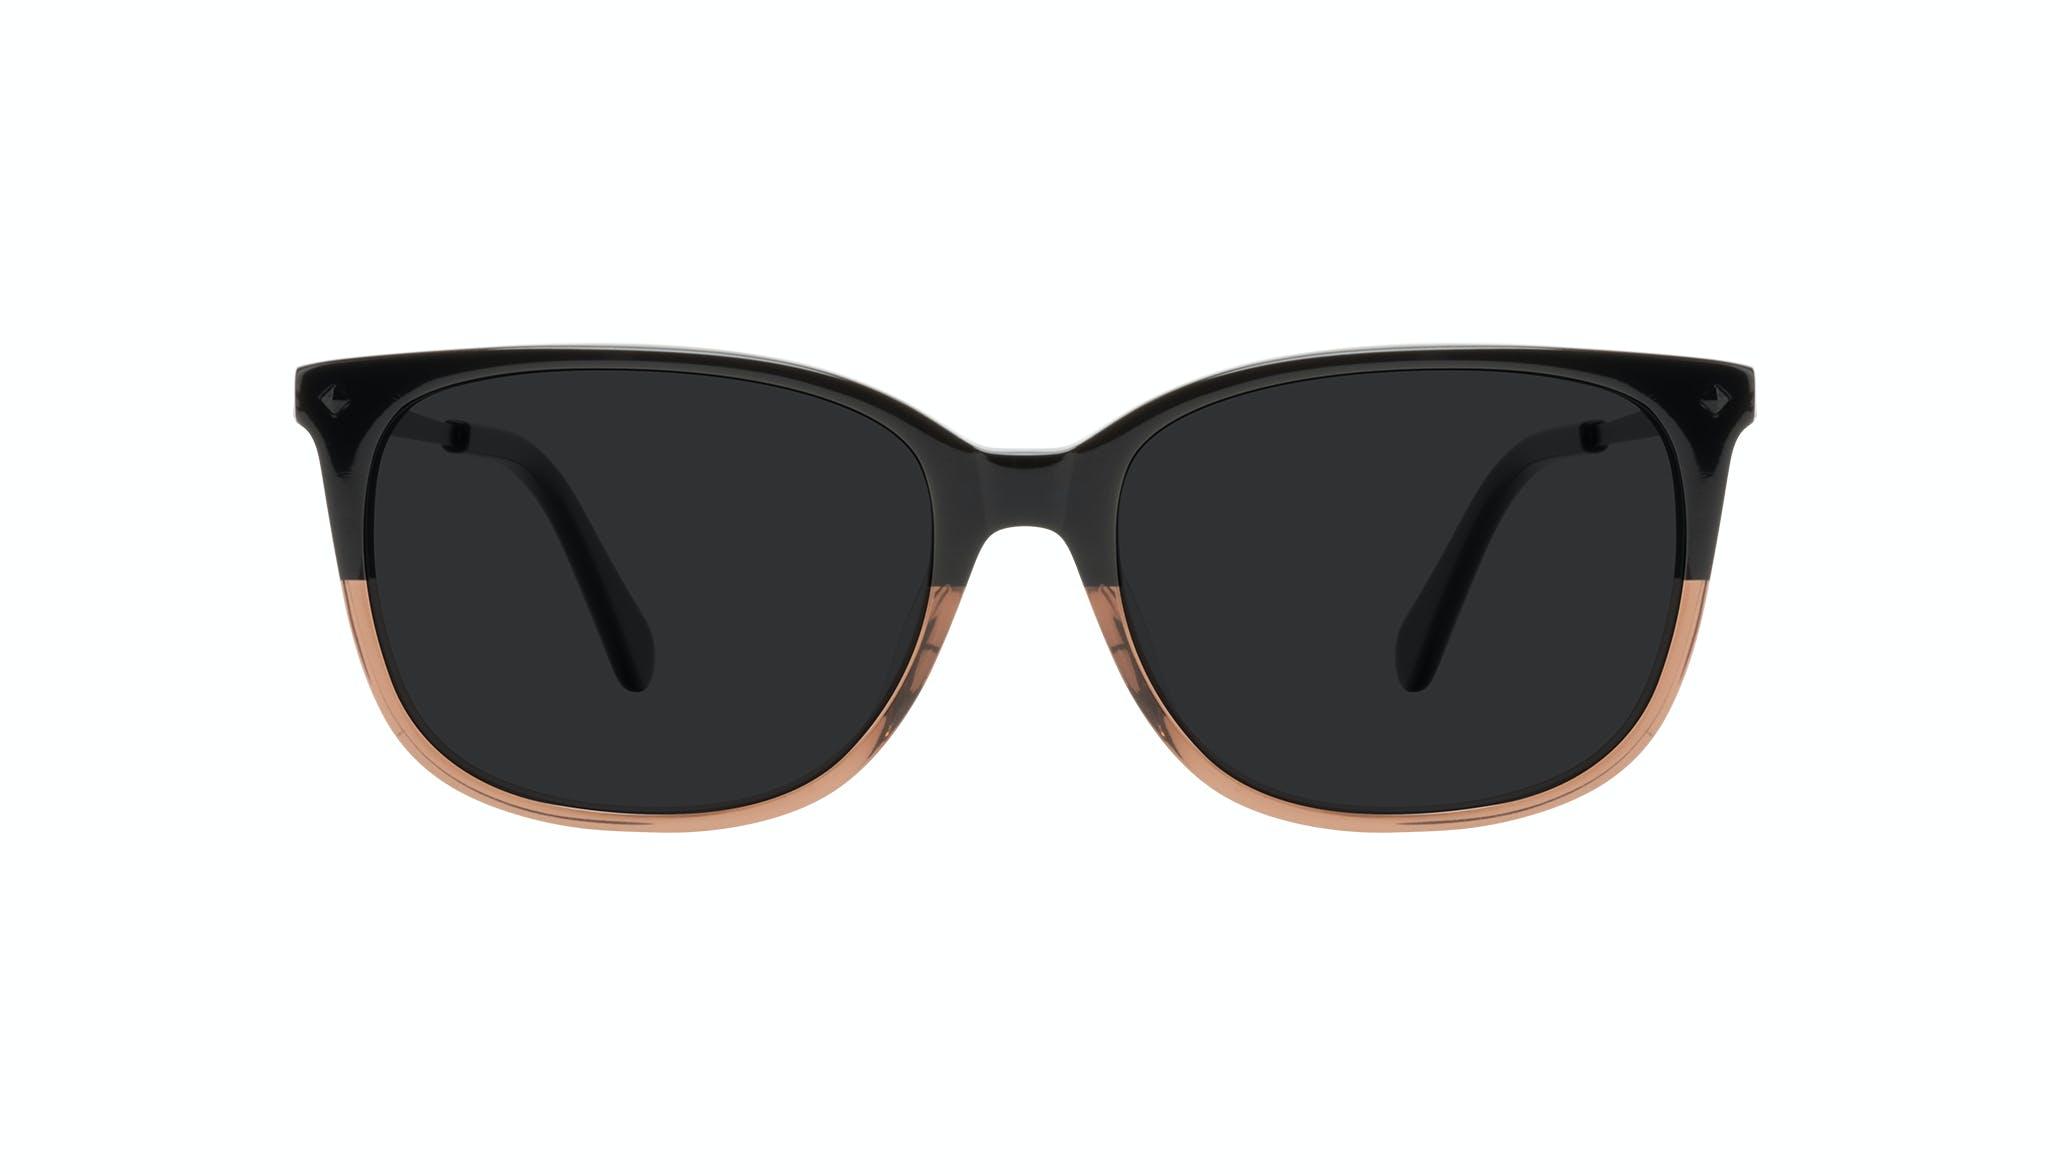 Affordable Fashion Glasses Rectangle Square Sunglasses Women Refine Wood Terra